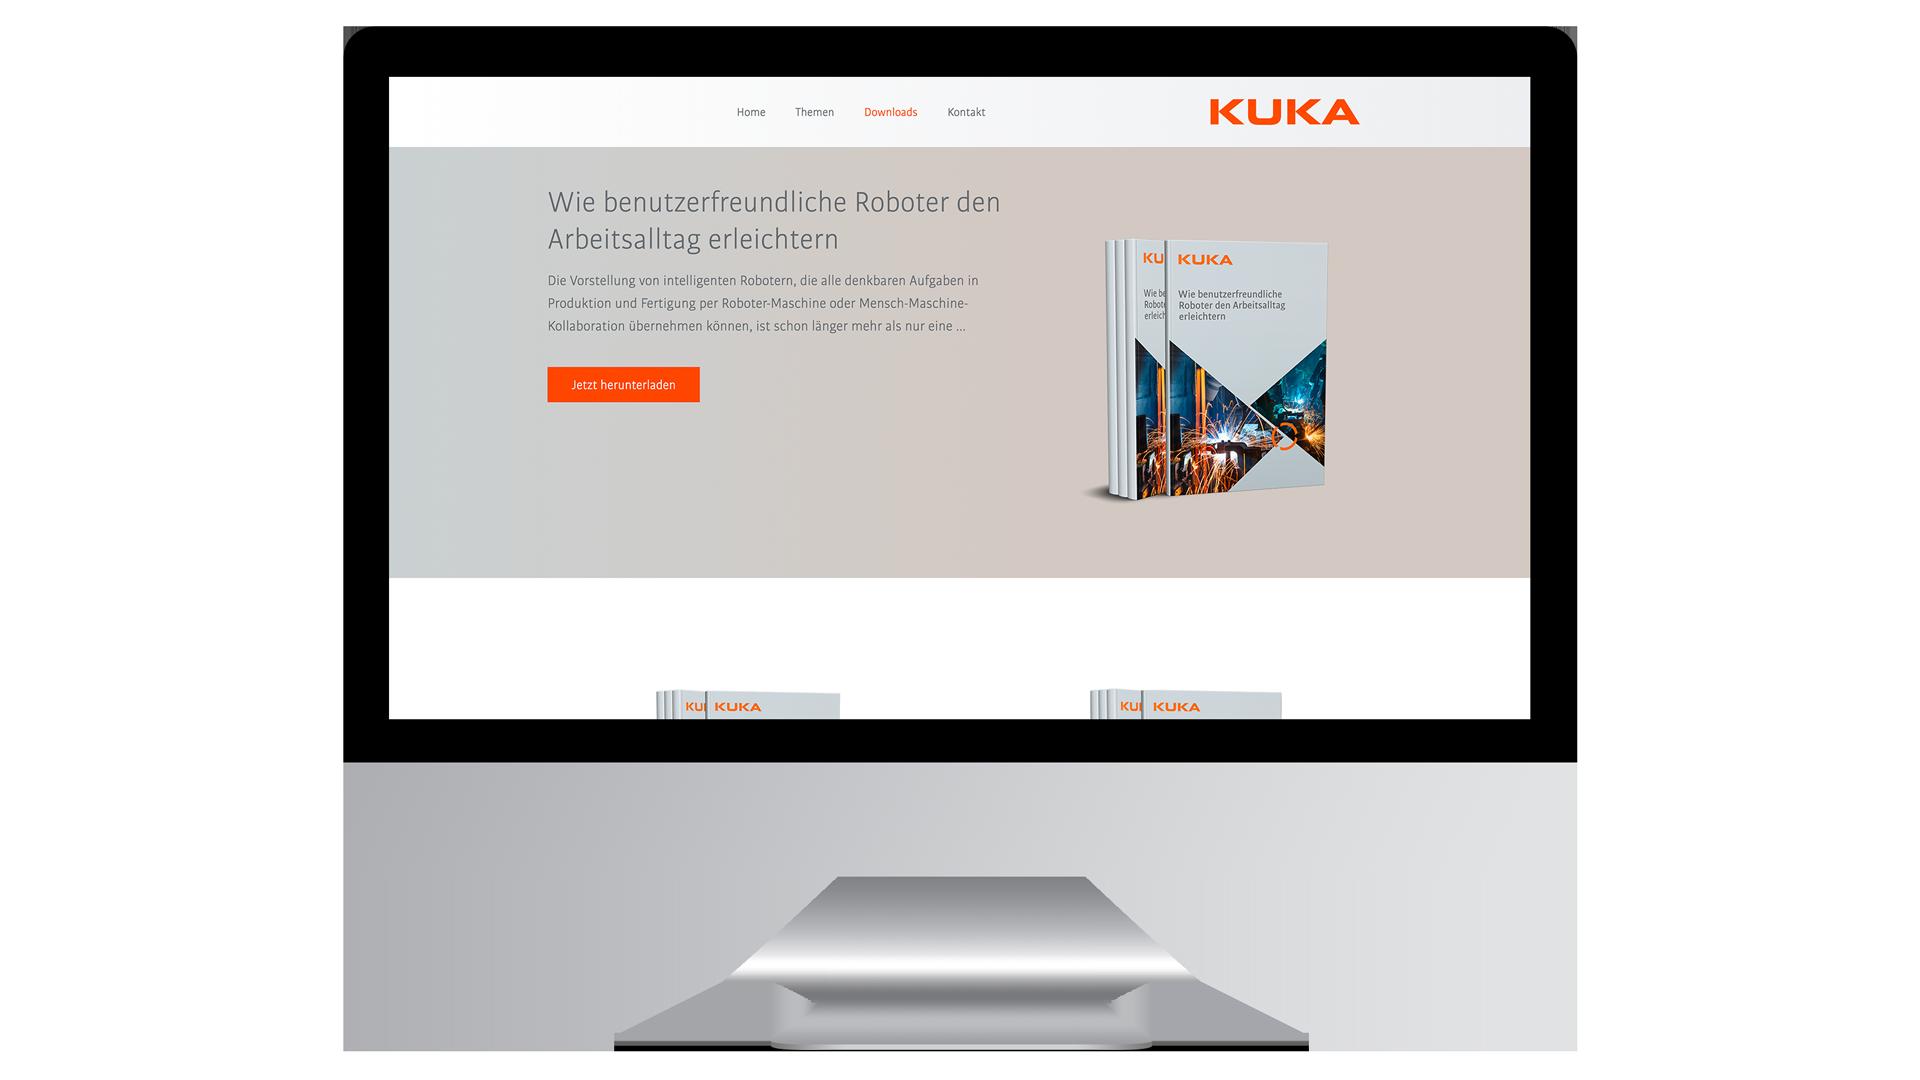 KUKA Website